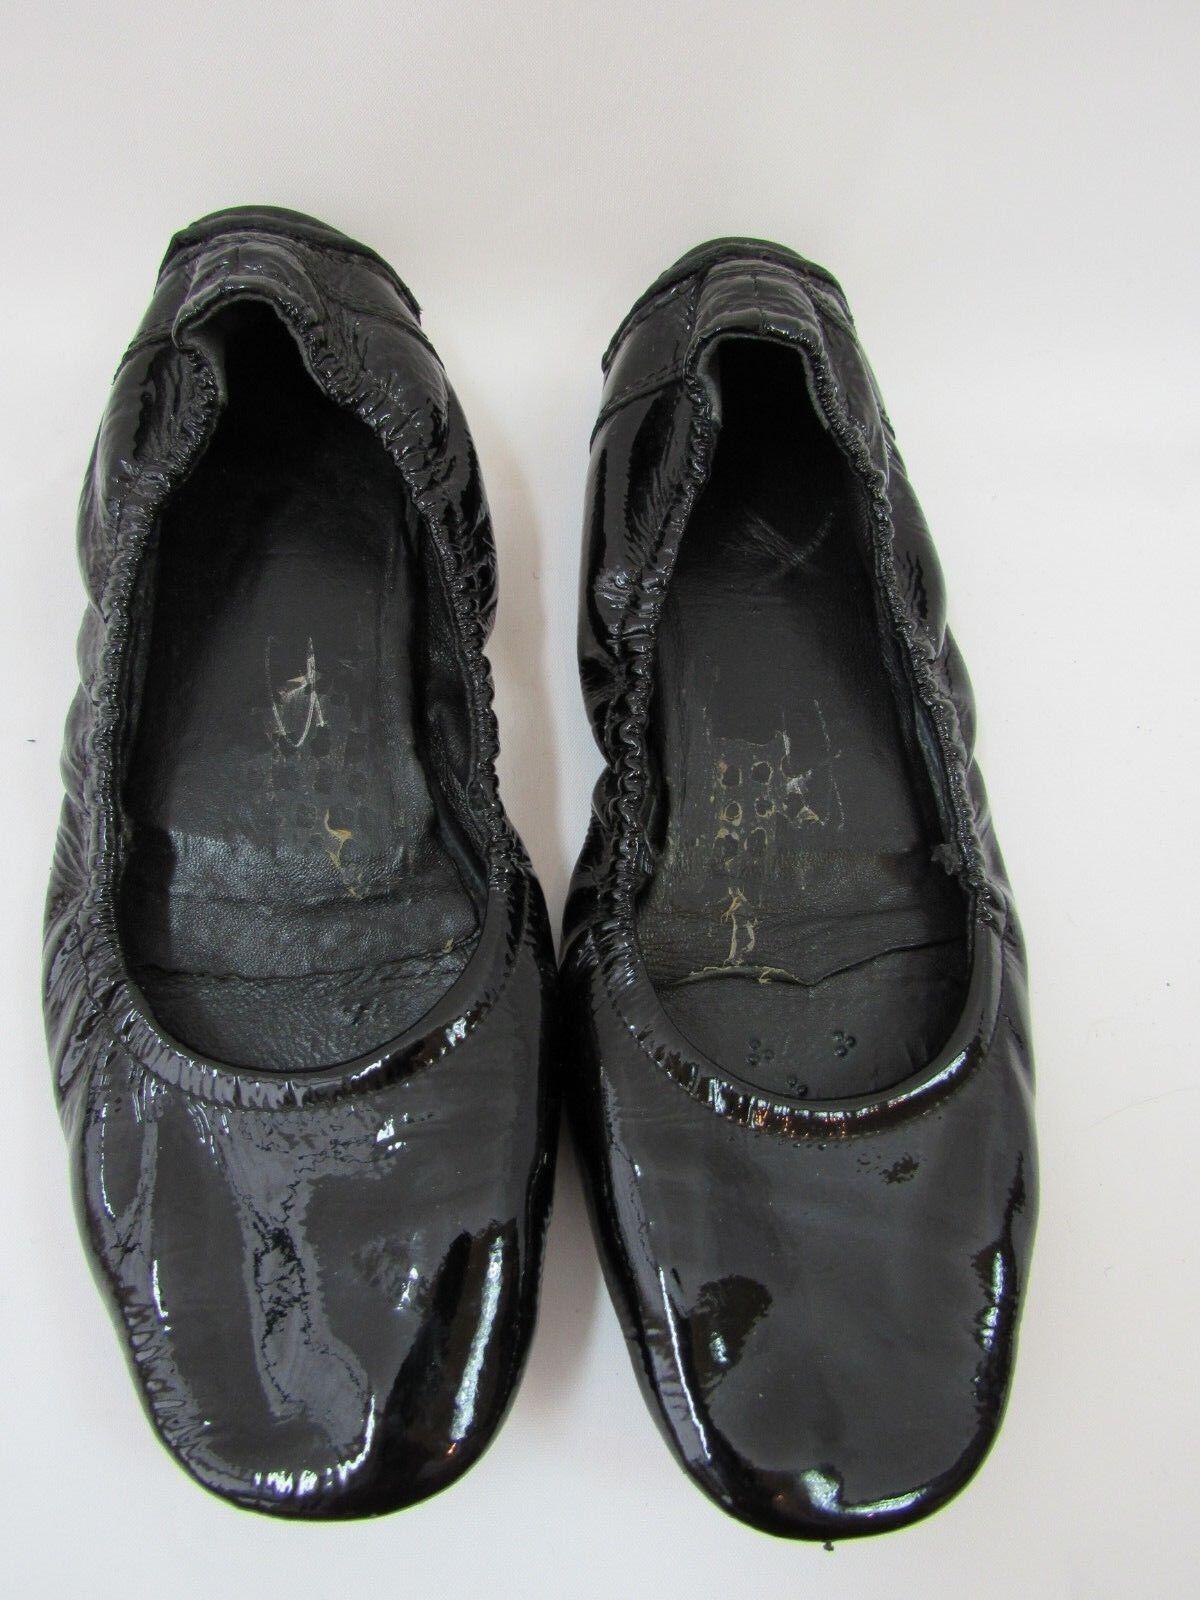 Prada Ballet Flats nero Patent Leather